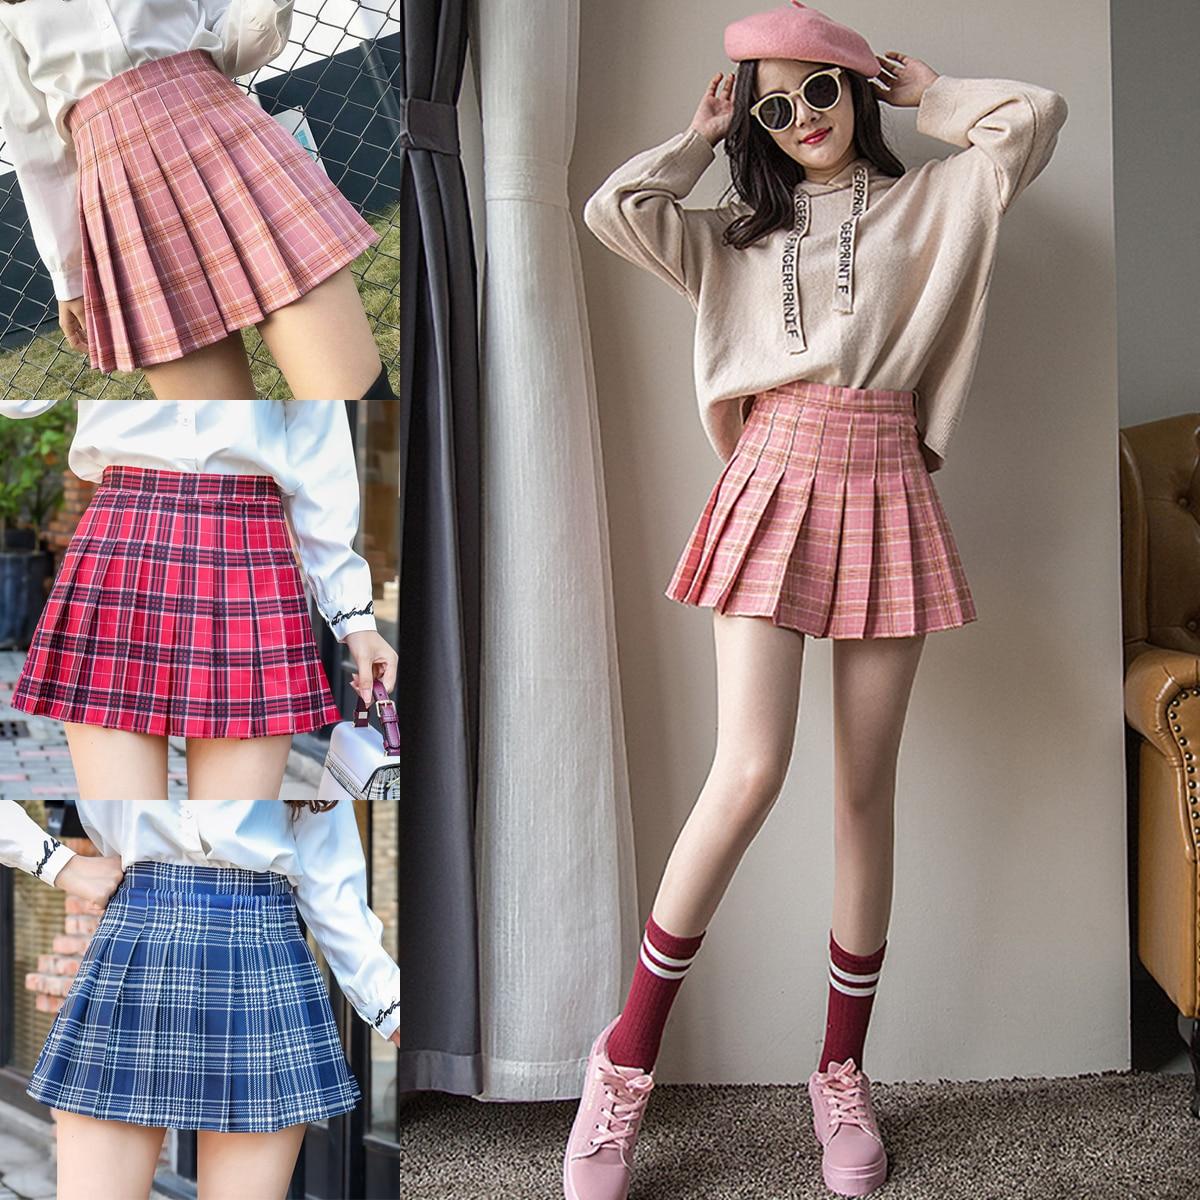 Women Summer Bottom Pink Plaid Mini Skirt Femme High Waist Pleated Skirts For Female Sport Training Skirt Uniform Tennis Skirts